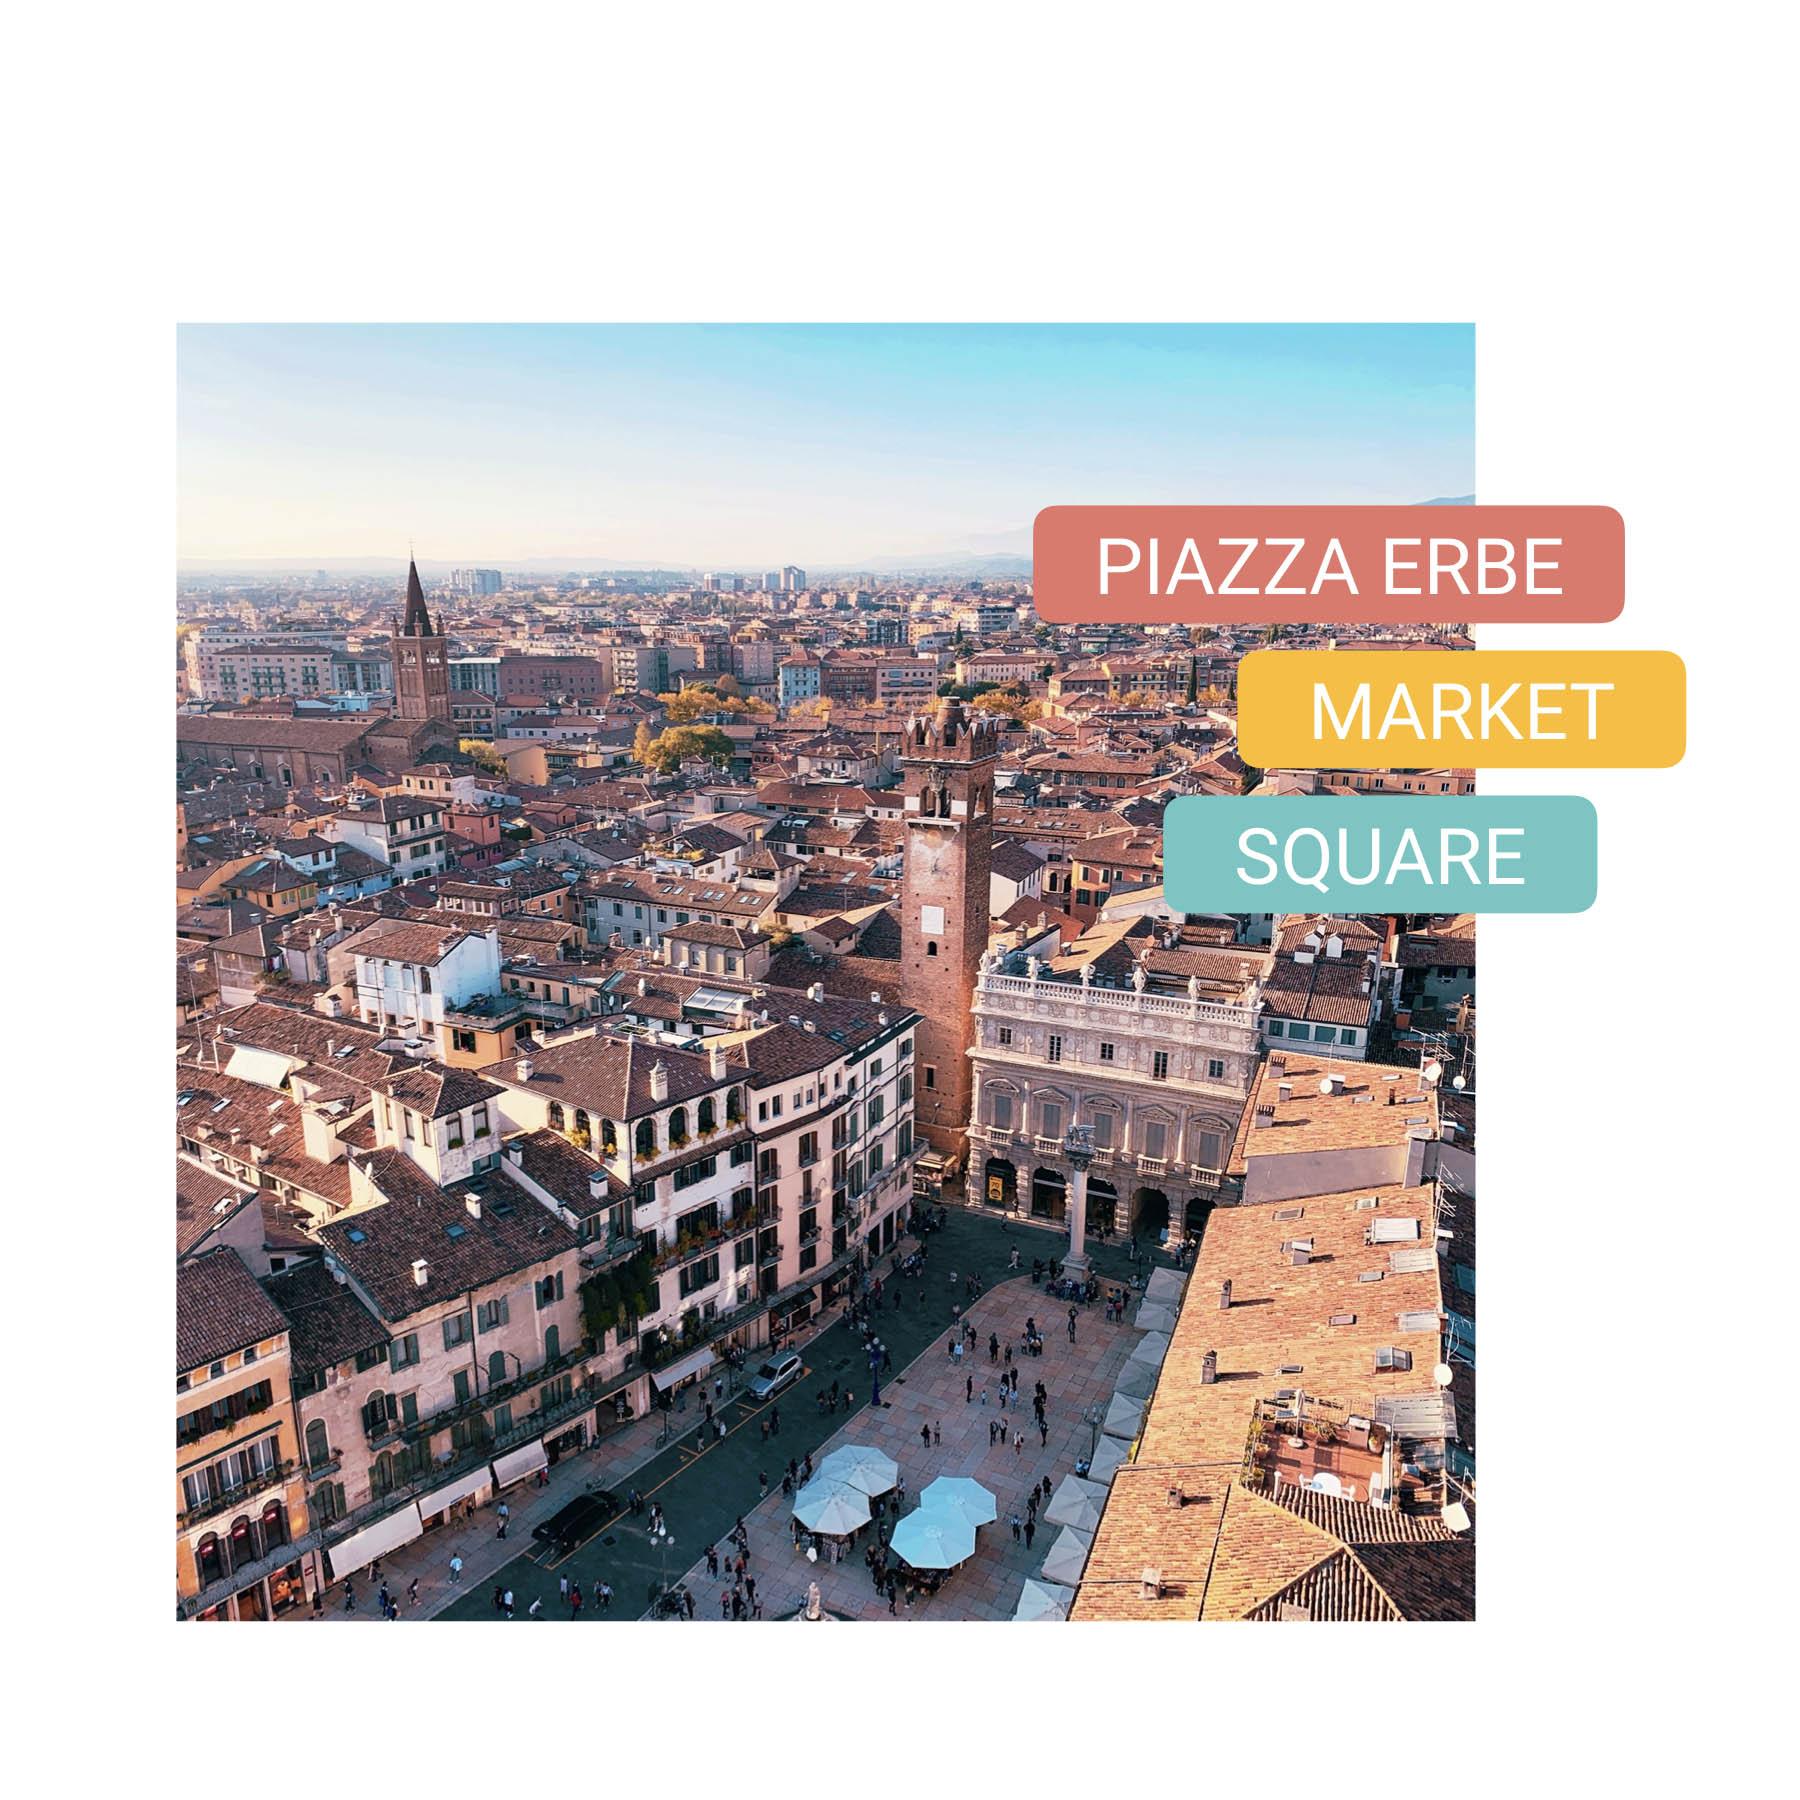 piazza erbe market square bike tour verona